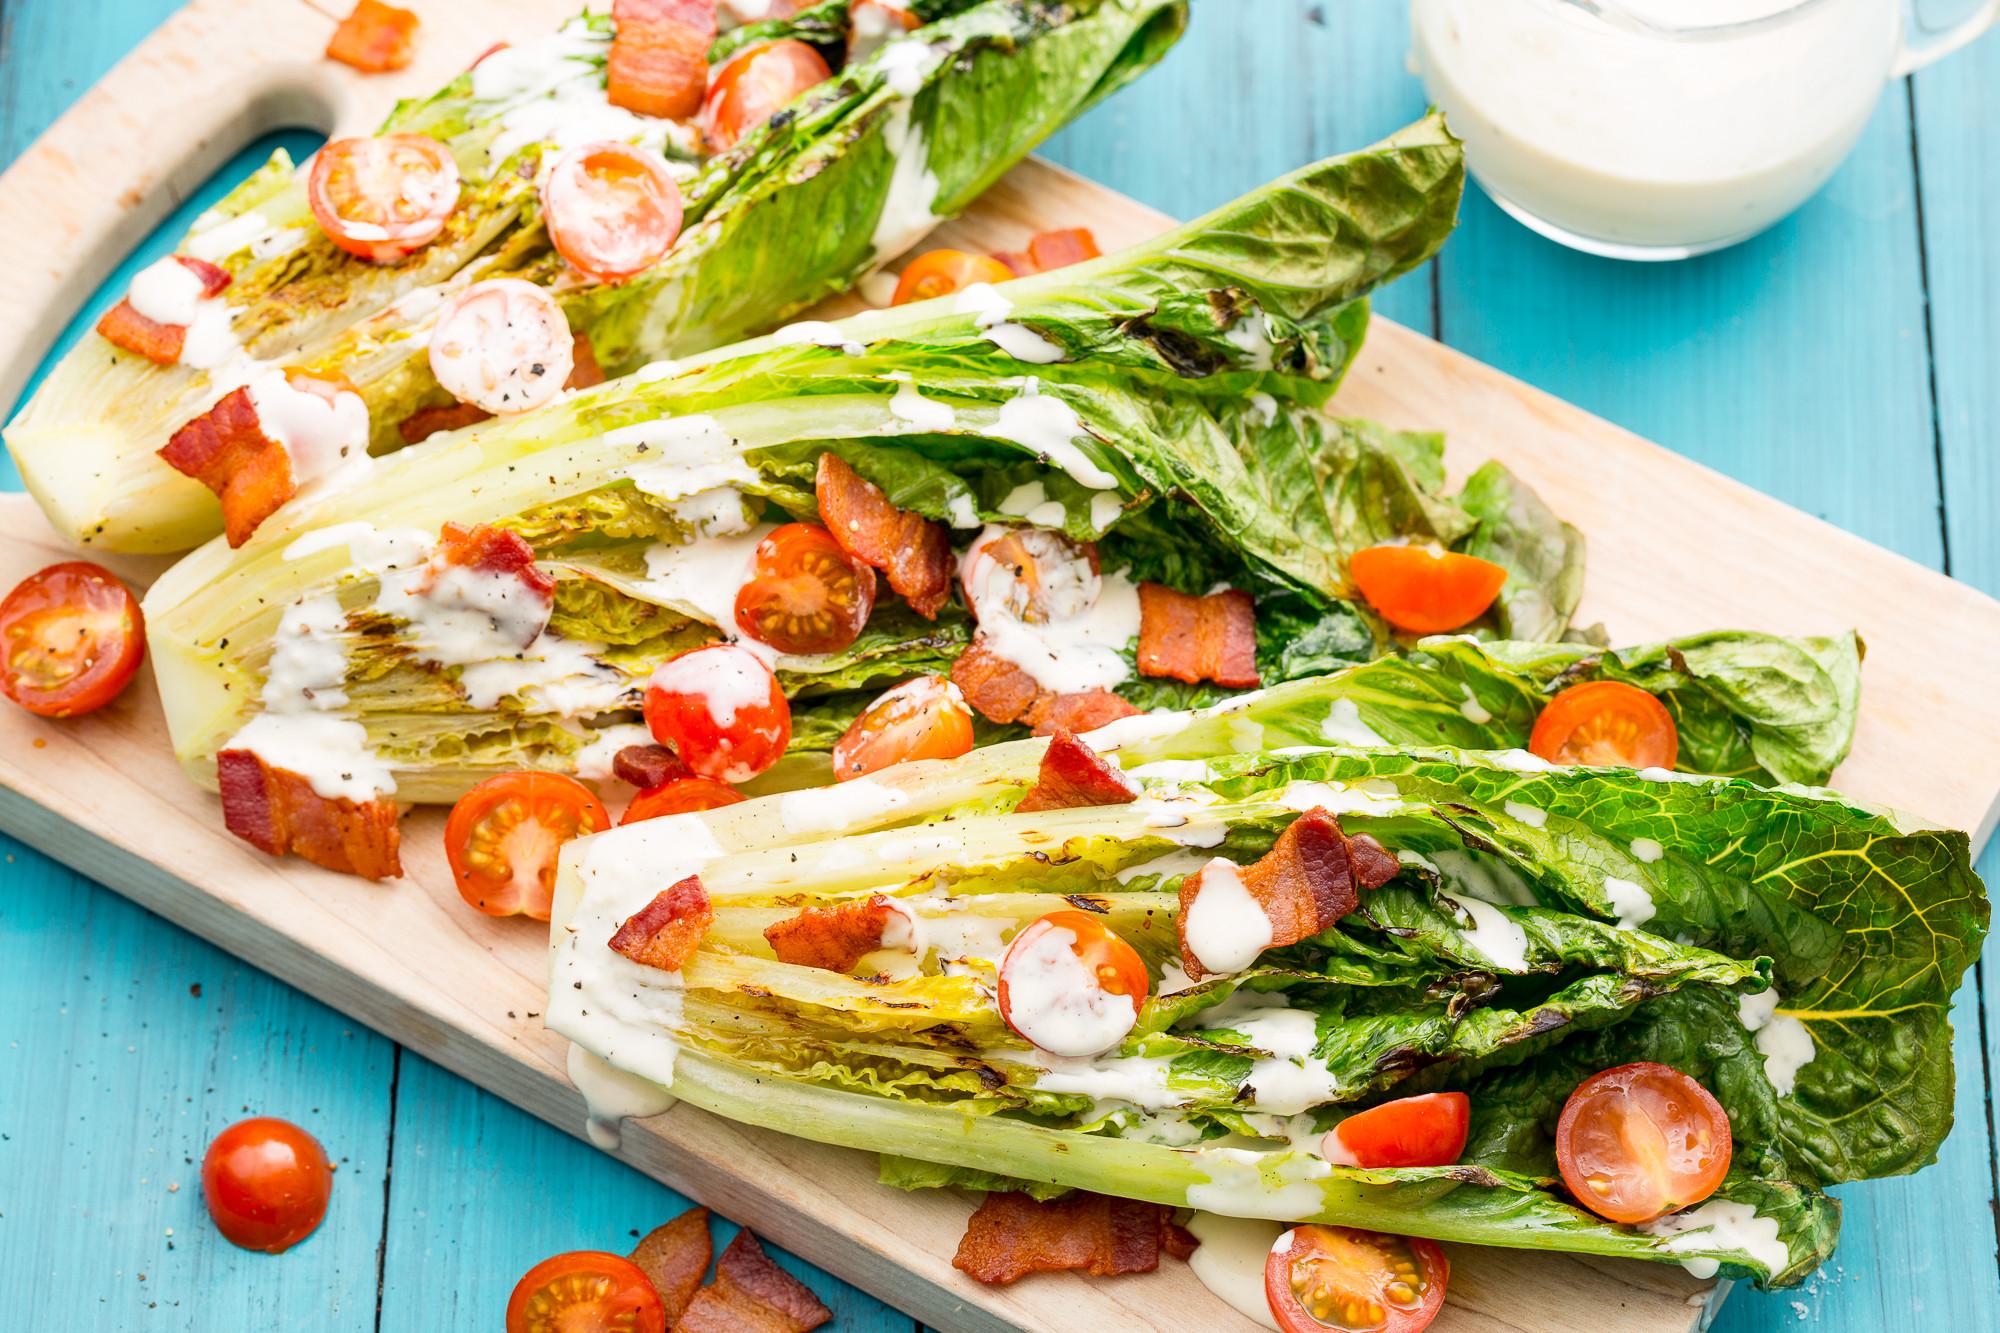 Healthy Summer Salads  100 Easy Summer Salad Recipes Healthy Salad Ideas for